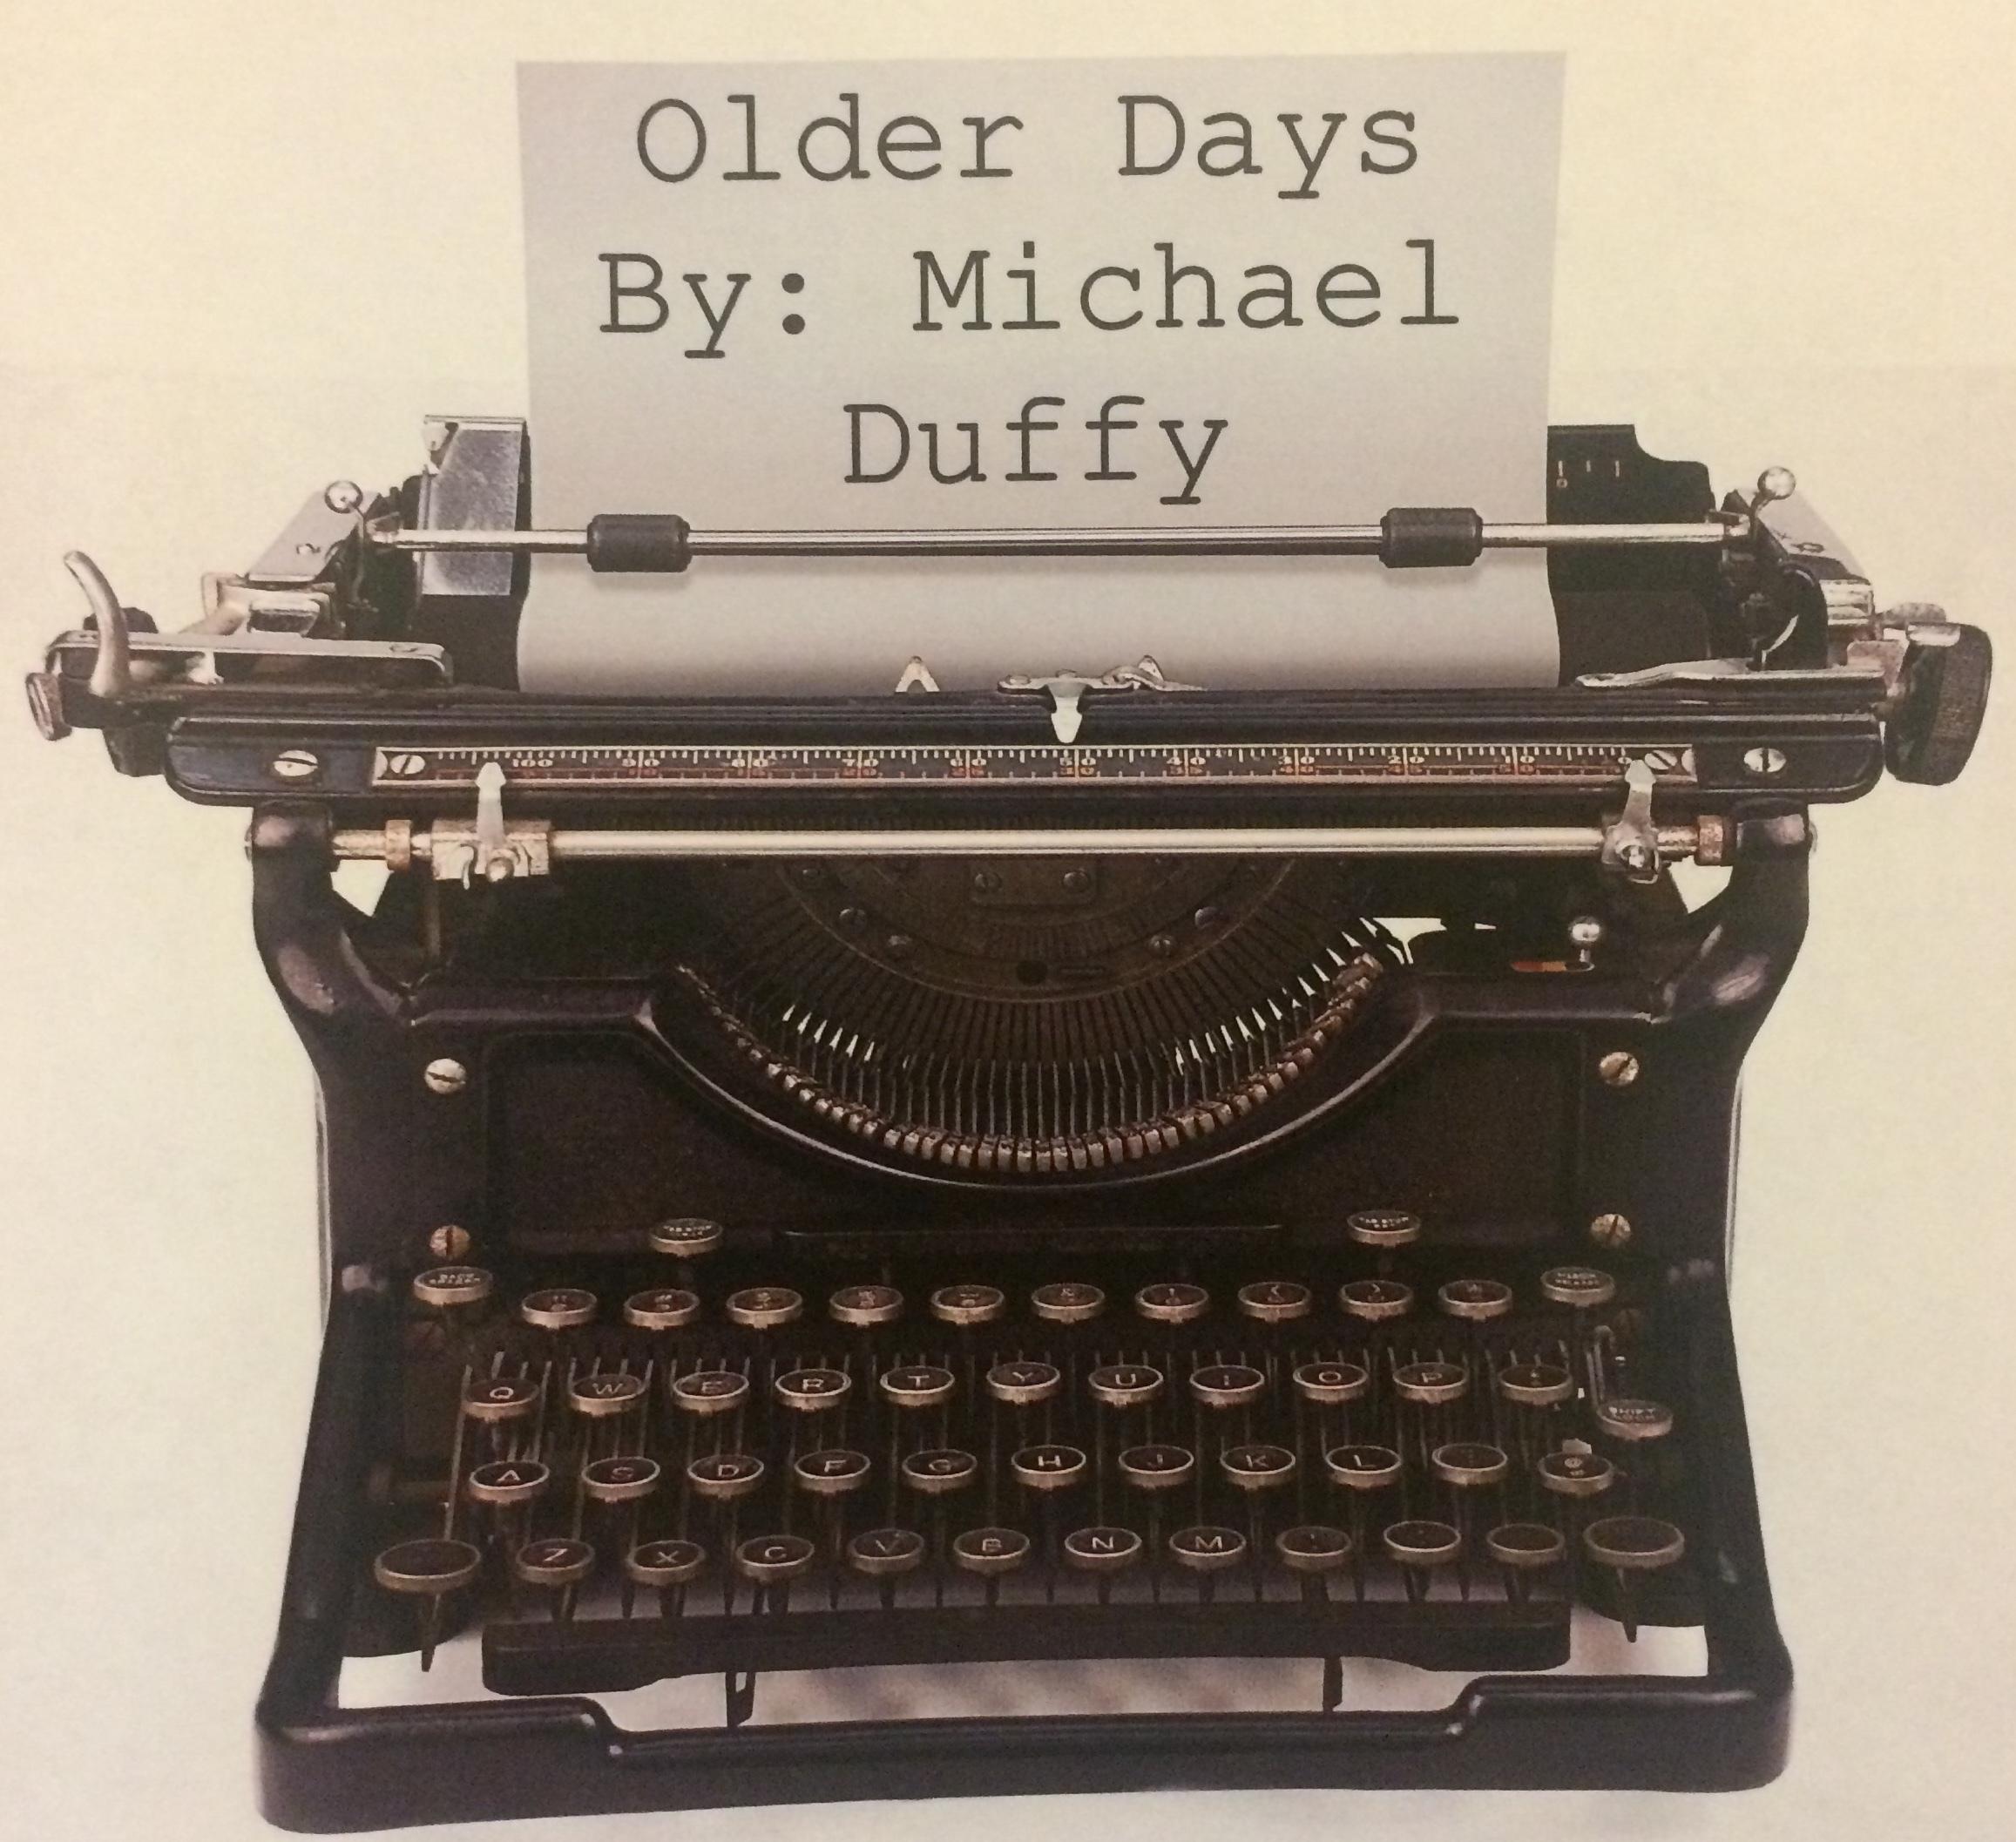 Older days